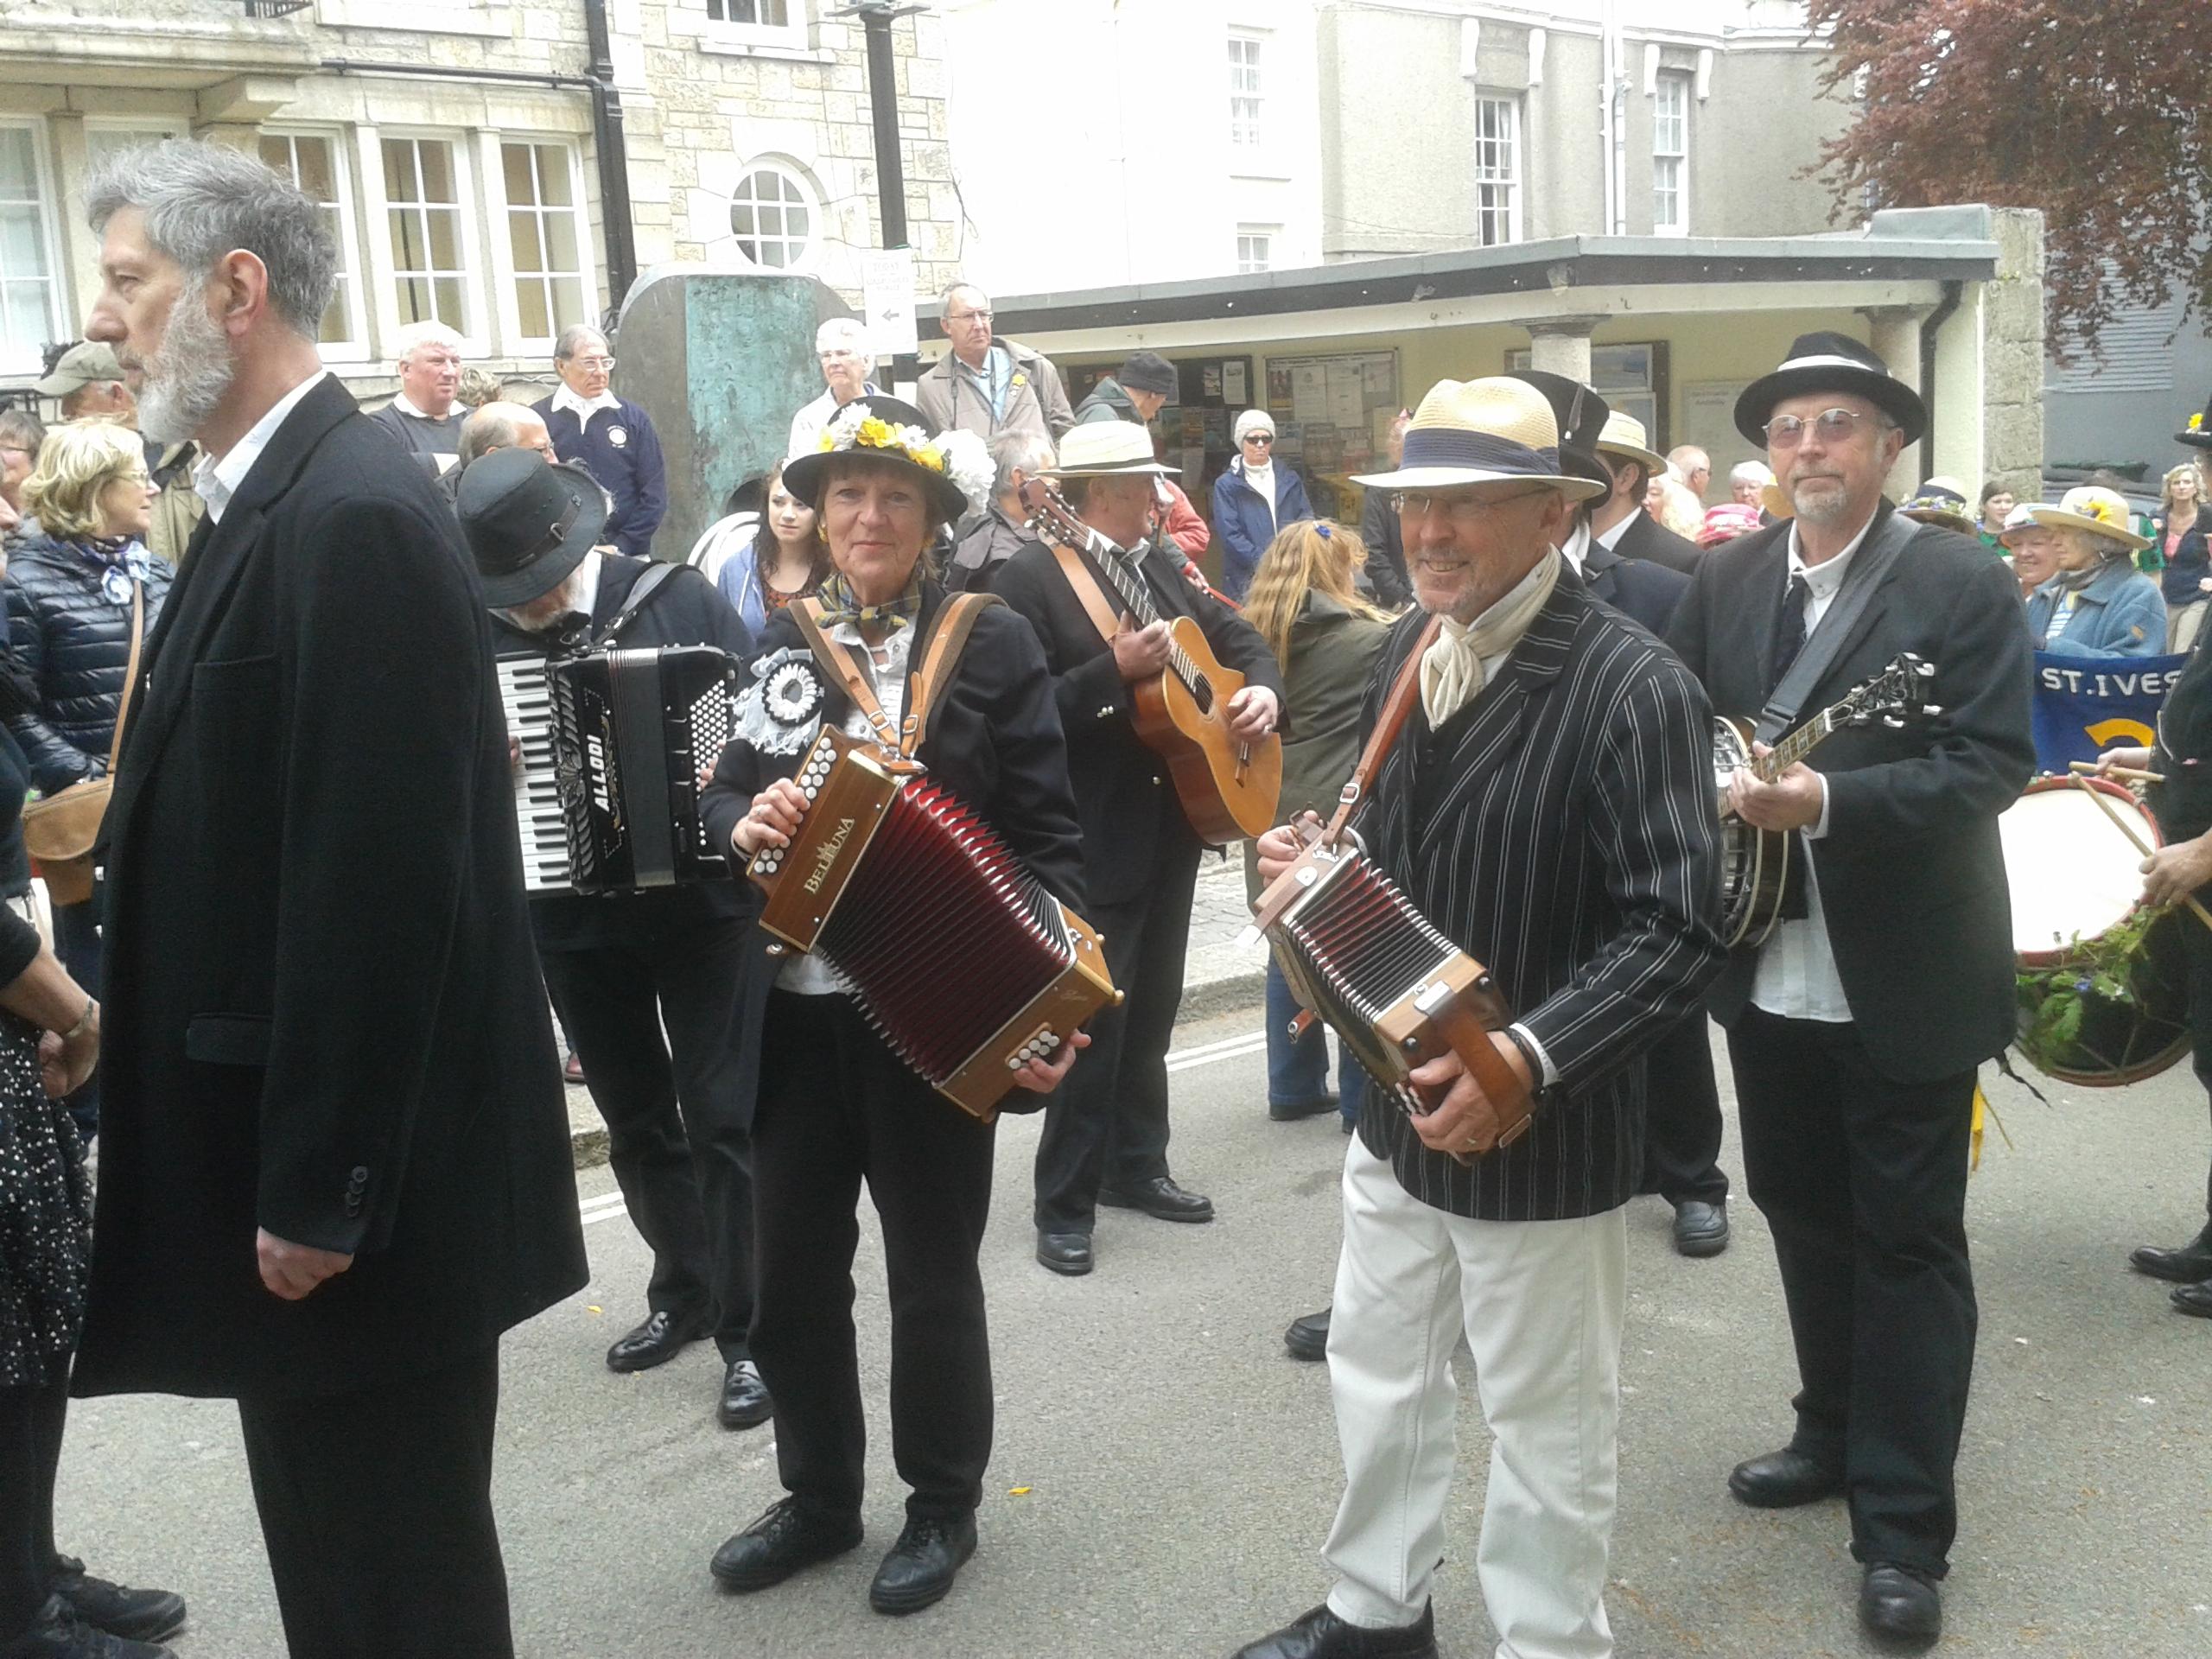 St Ives Feast Bagas Porthia Cornwall 365 Cornish Cultural Calendar